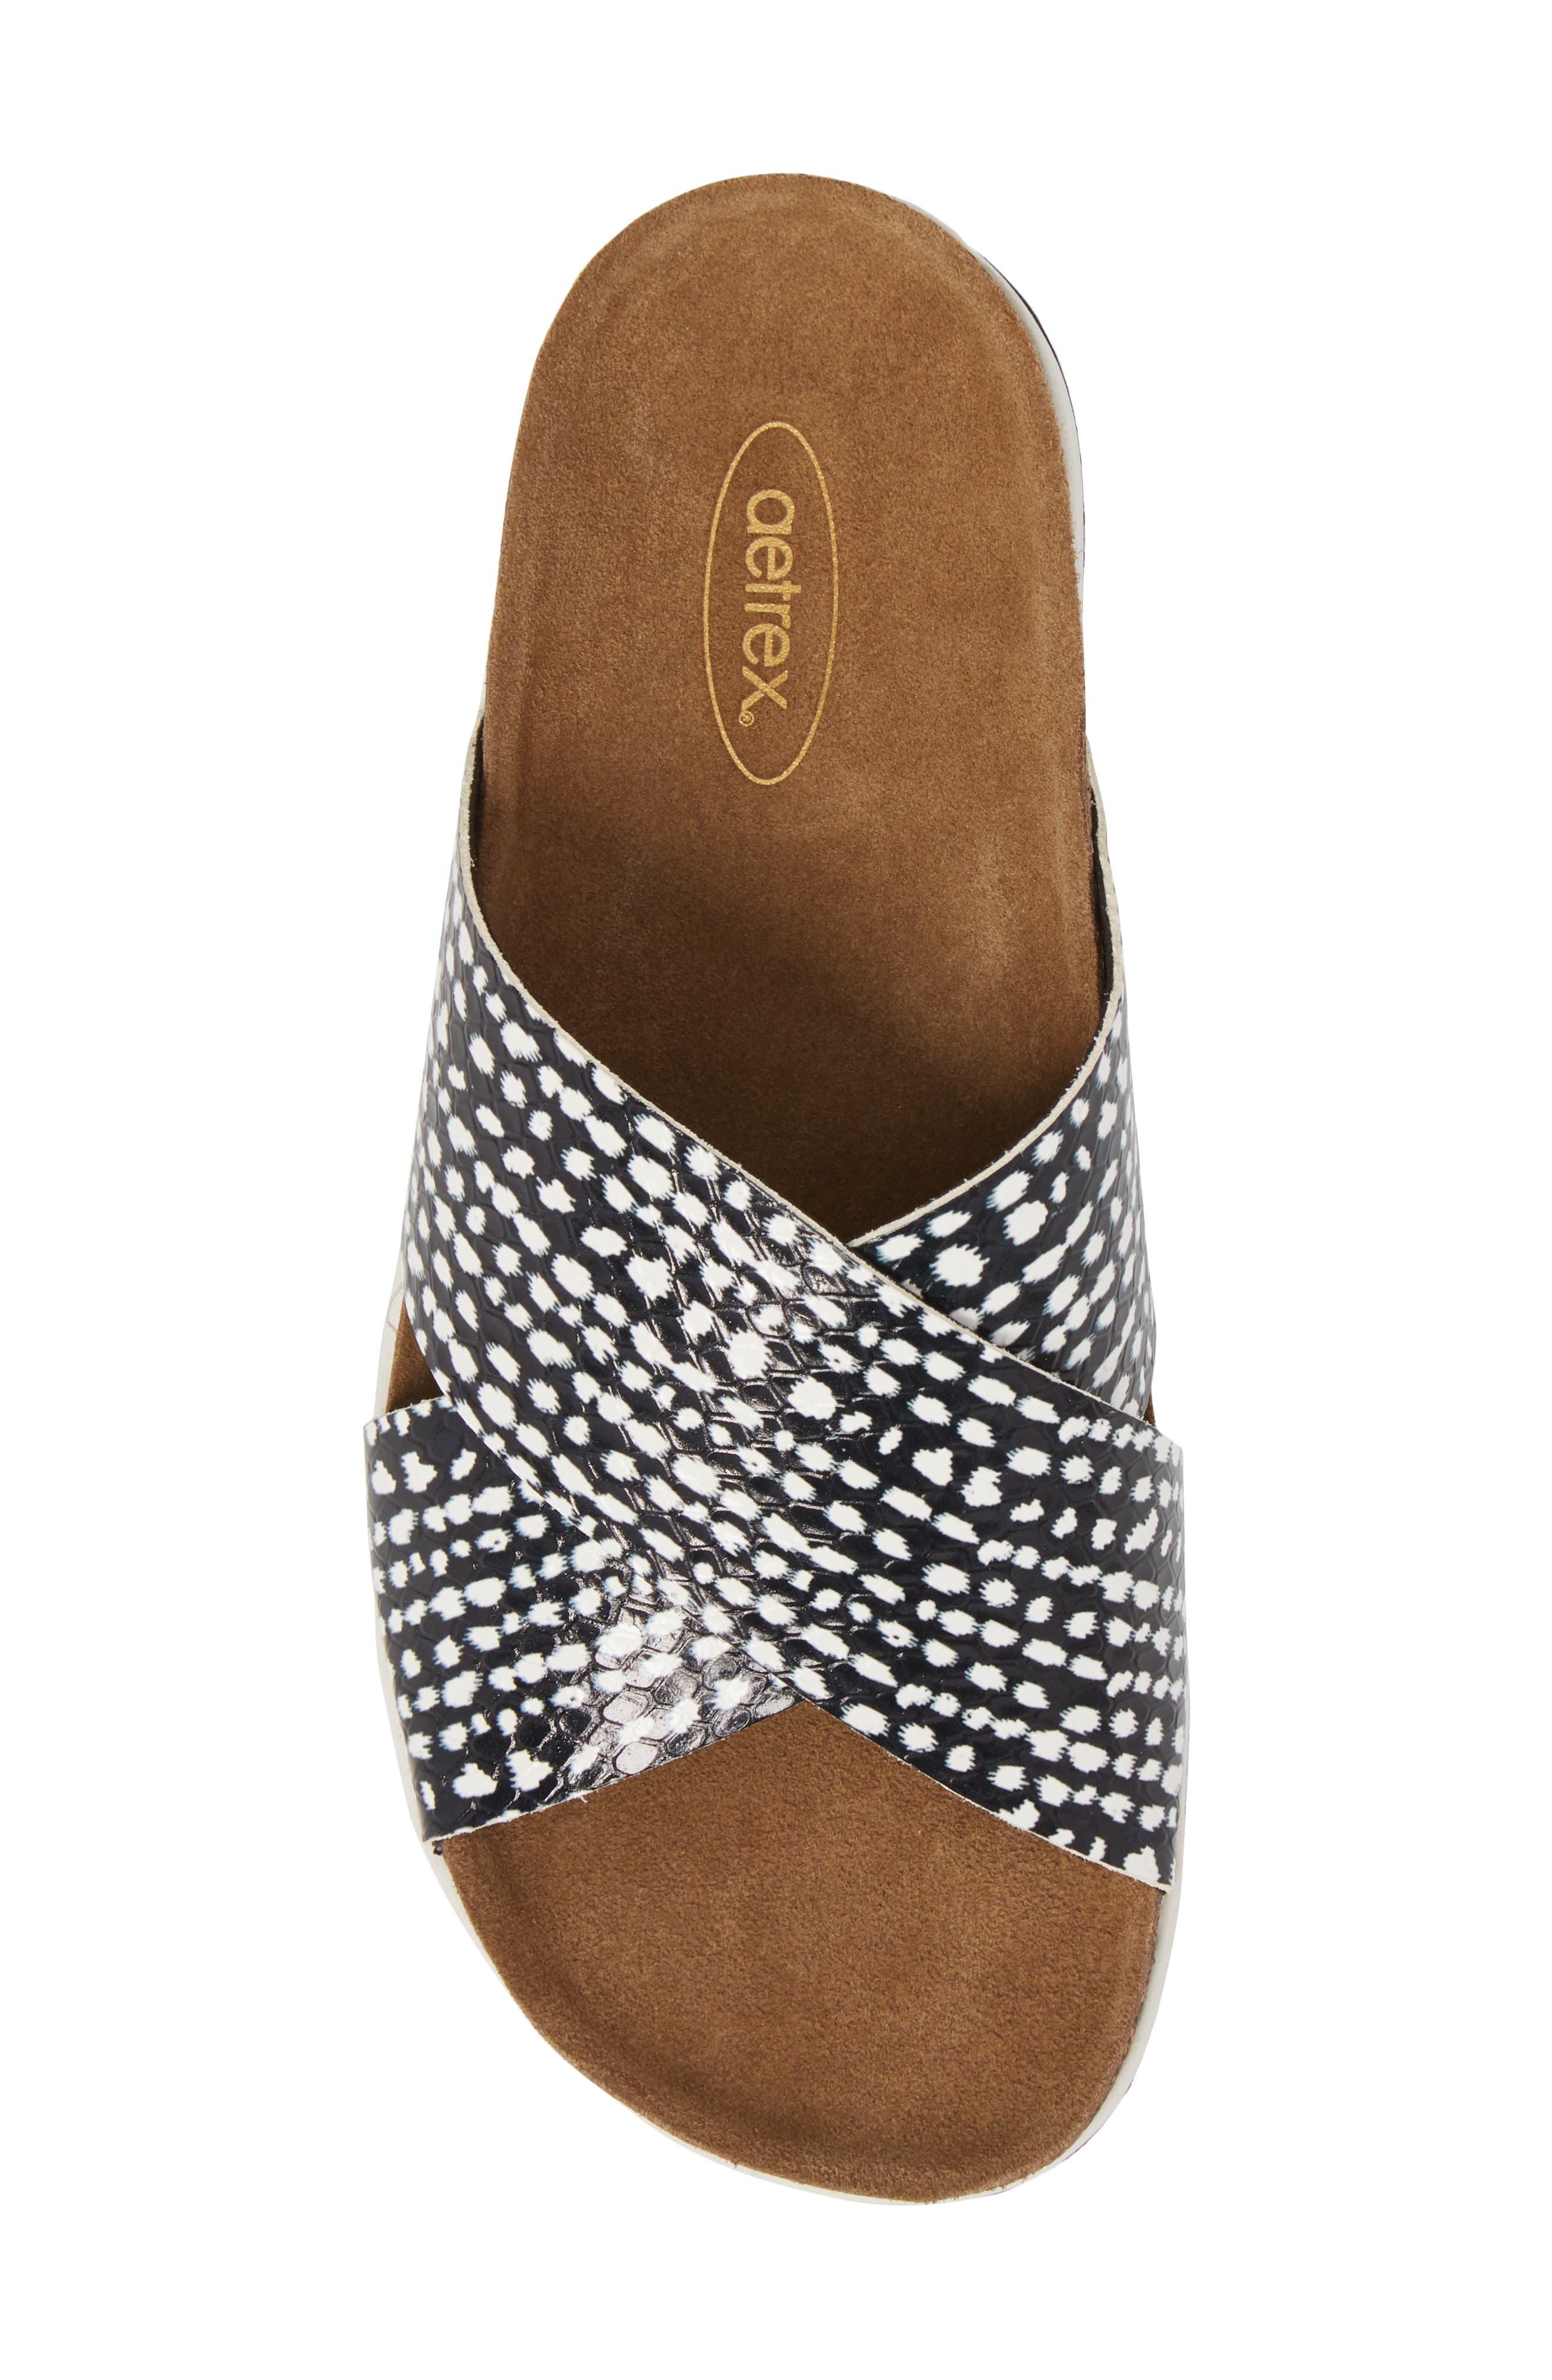 Dawn Slide Sandal,                             Alternate thumbnail 5, color,                             Panda Print Leather